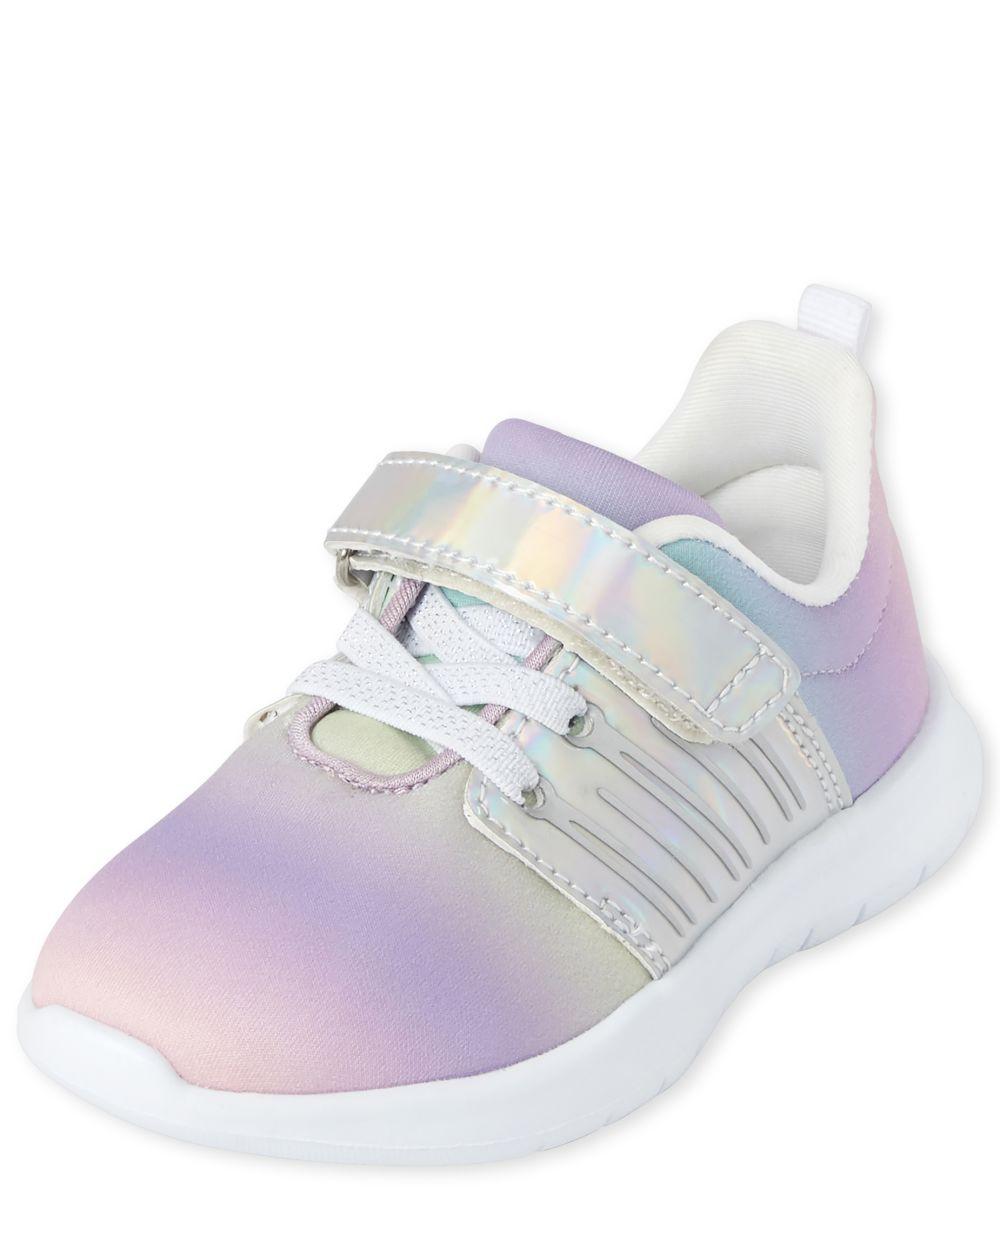 Zapatillas de running Rainbow para niñas pequeñas